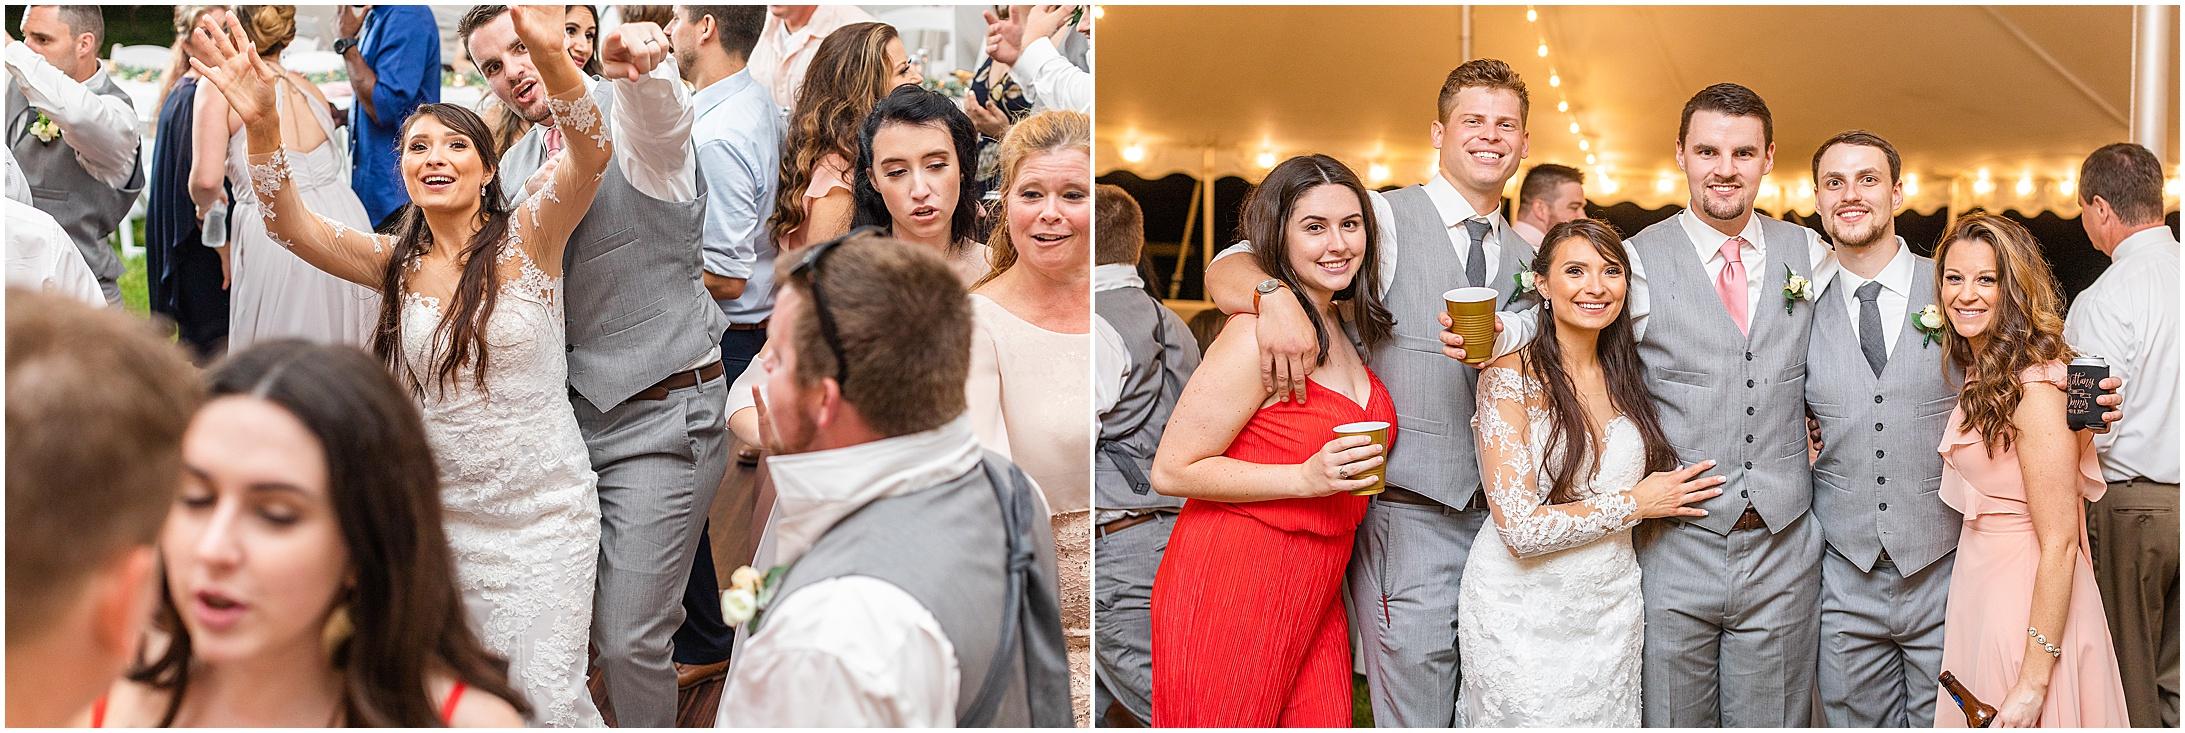 Maryland-Wedding-Photographer_0245.jpg